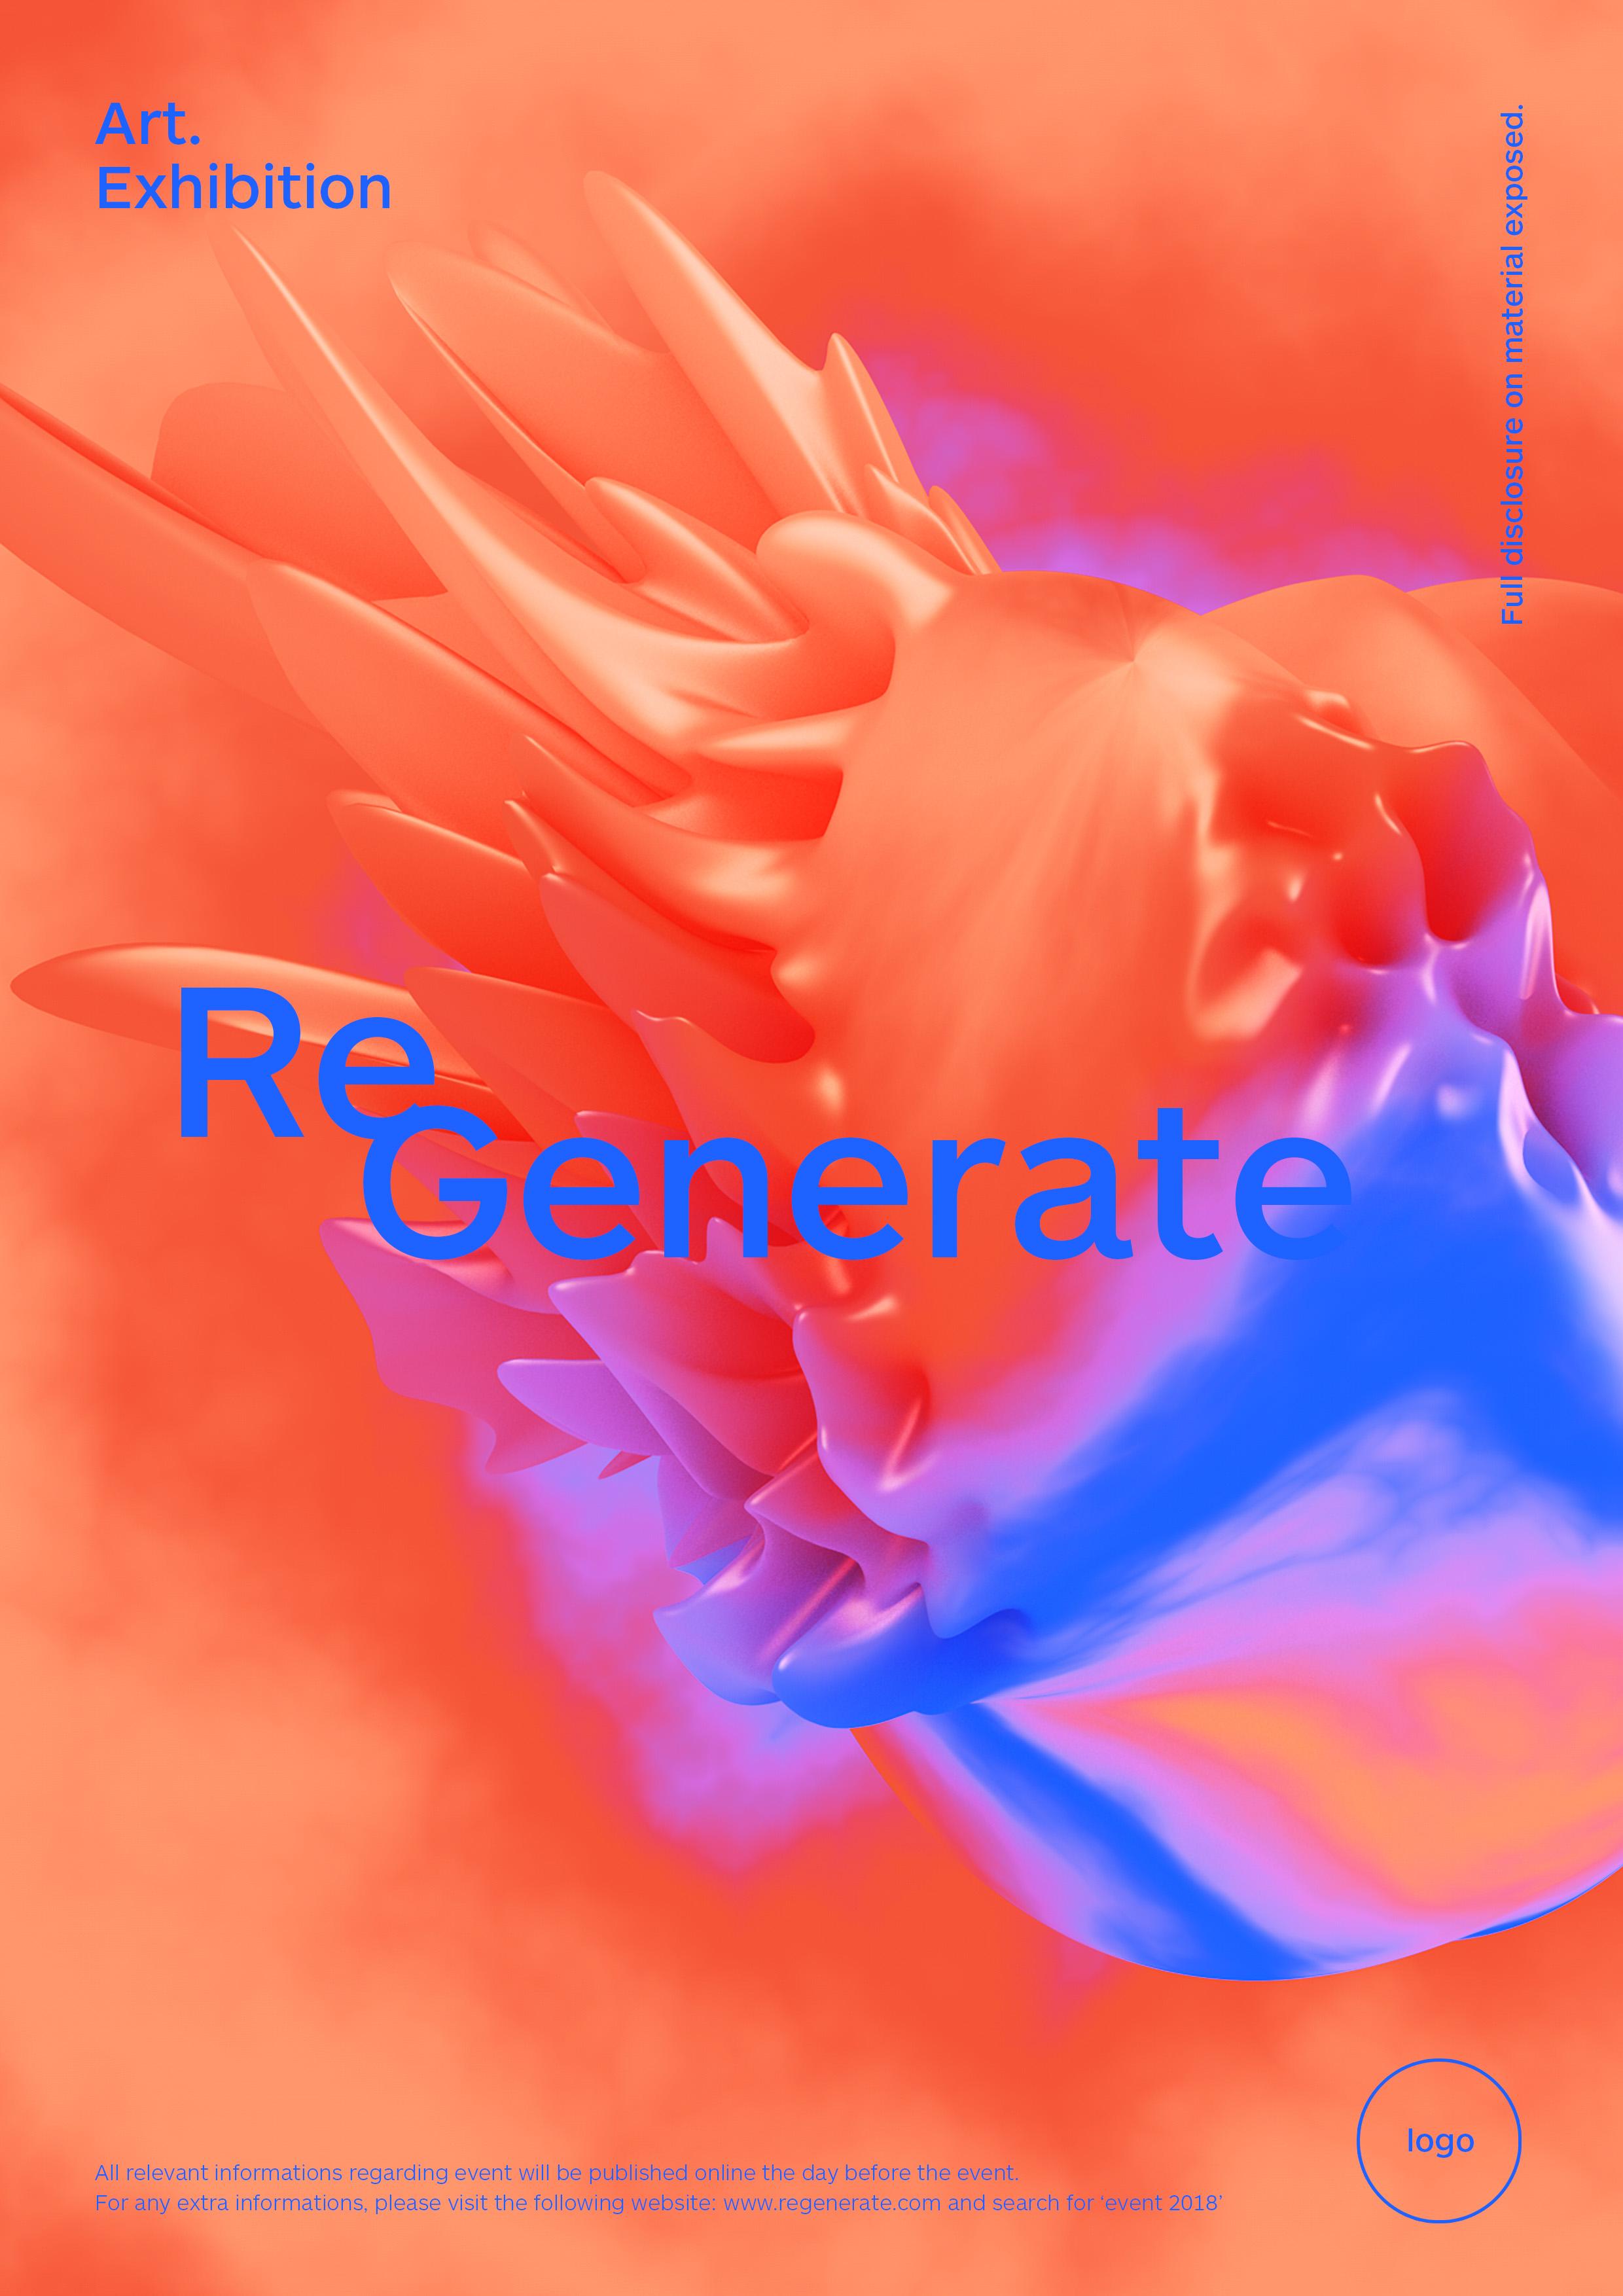 ReGenerate_Test 1_A4_004.jpg